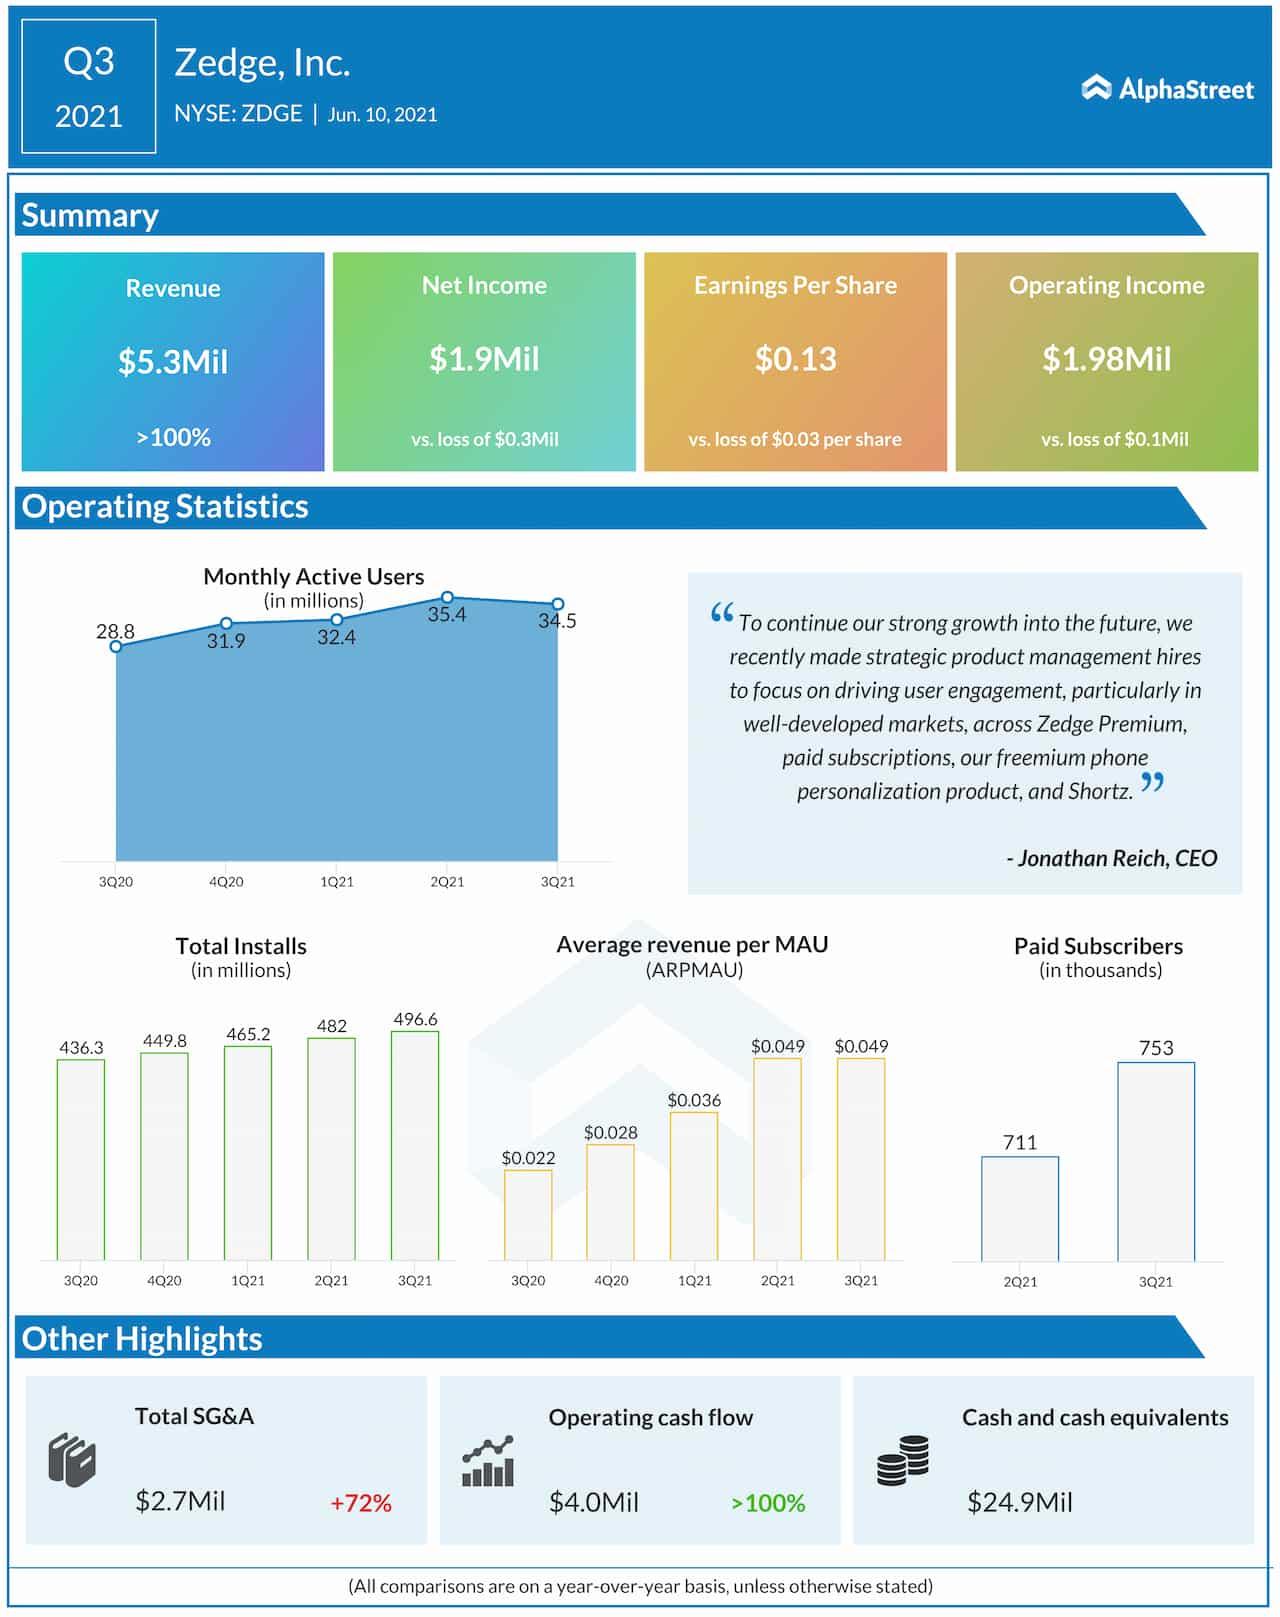 Zedge Q3 2021 Earnings Infographic